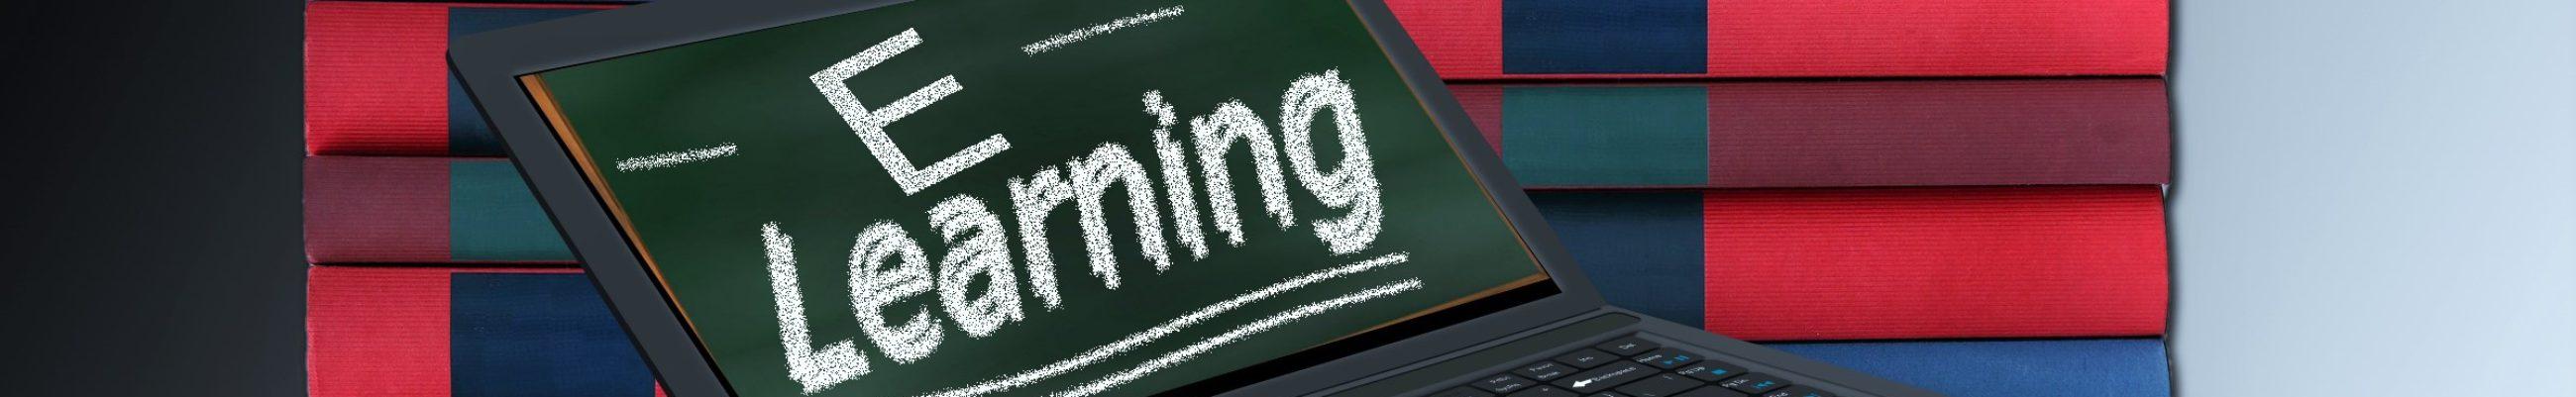 Deutsch Lernen Onlinen mit E-learning